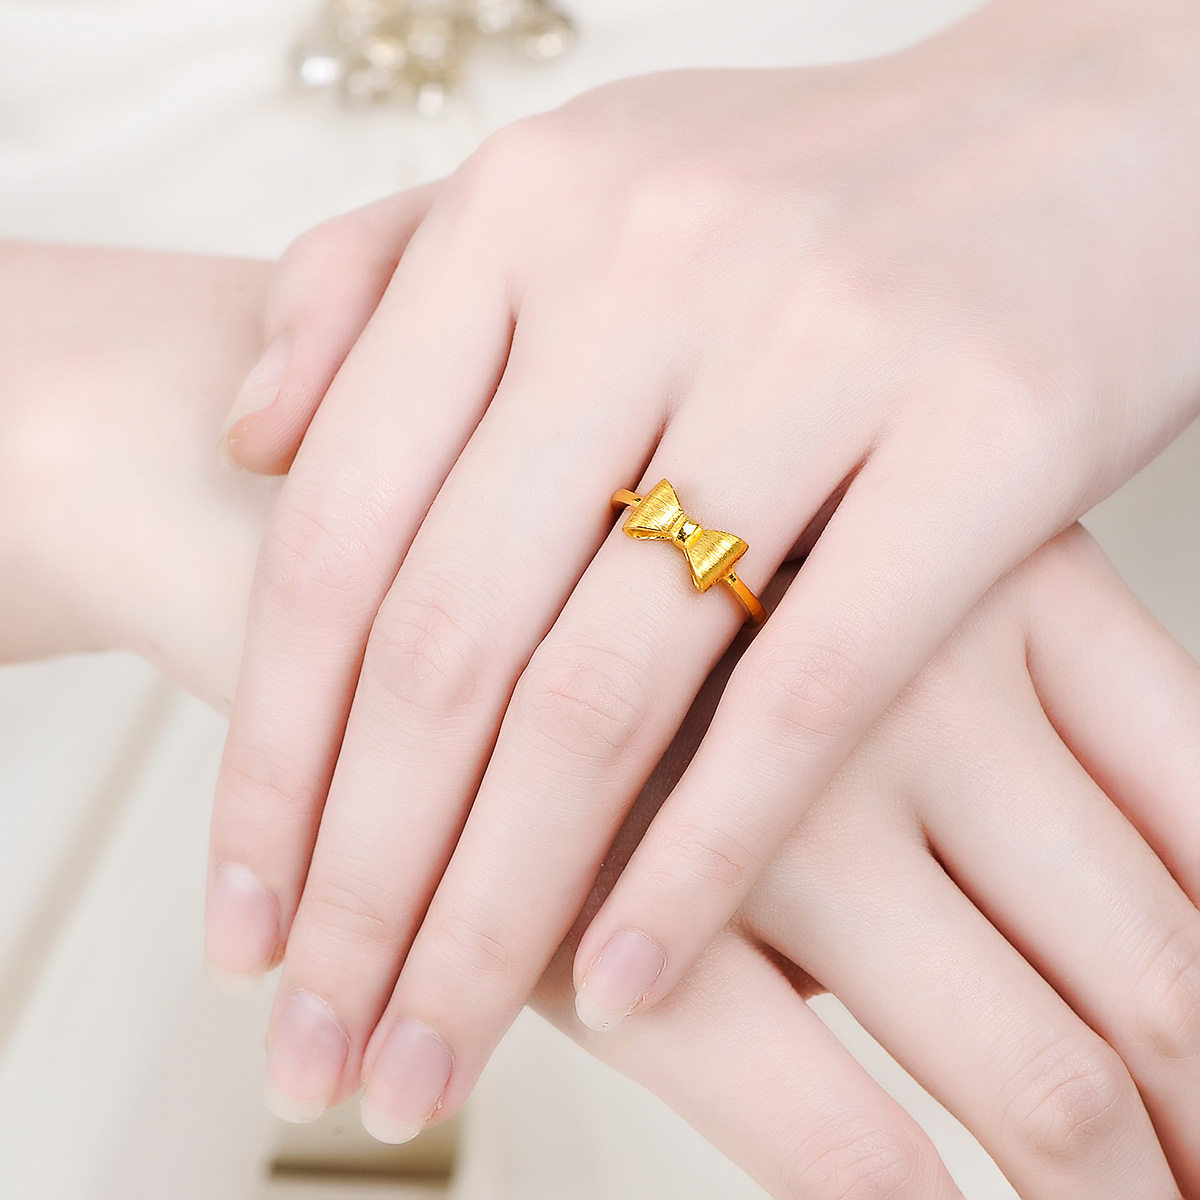 TSL Xie ruilin price gold ring live female models fashion brushed ...